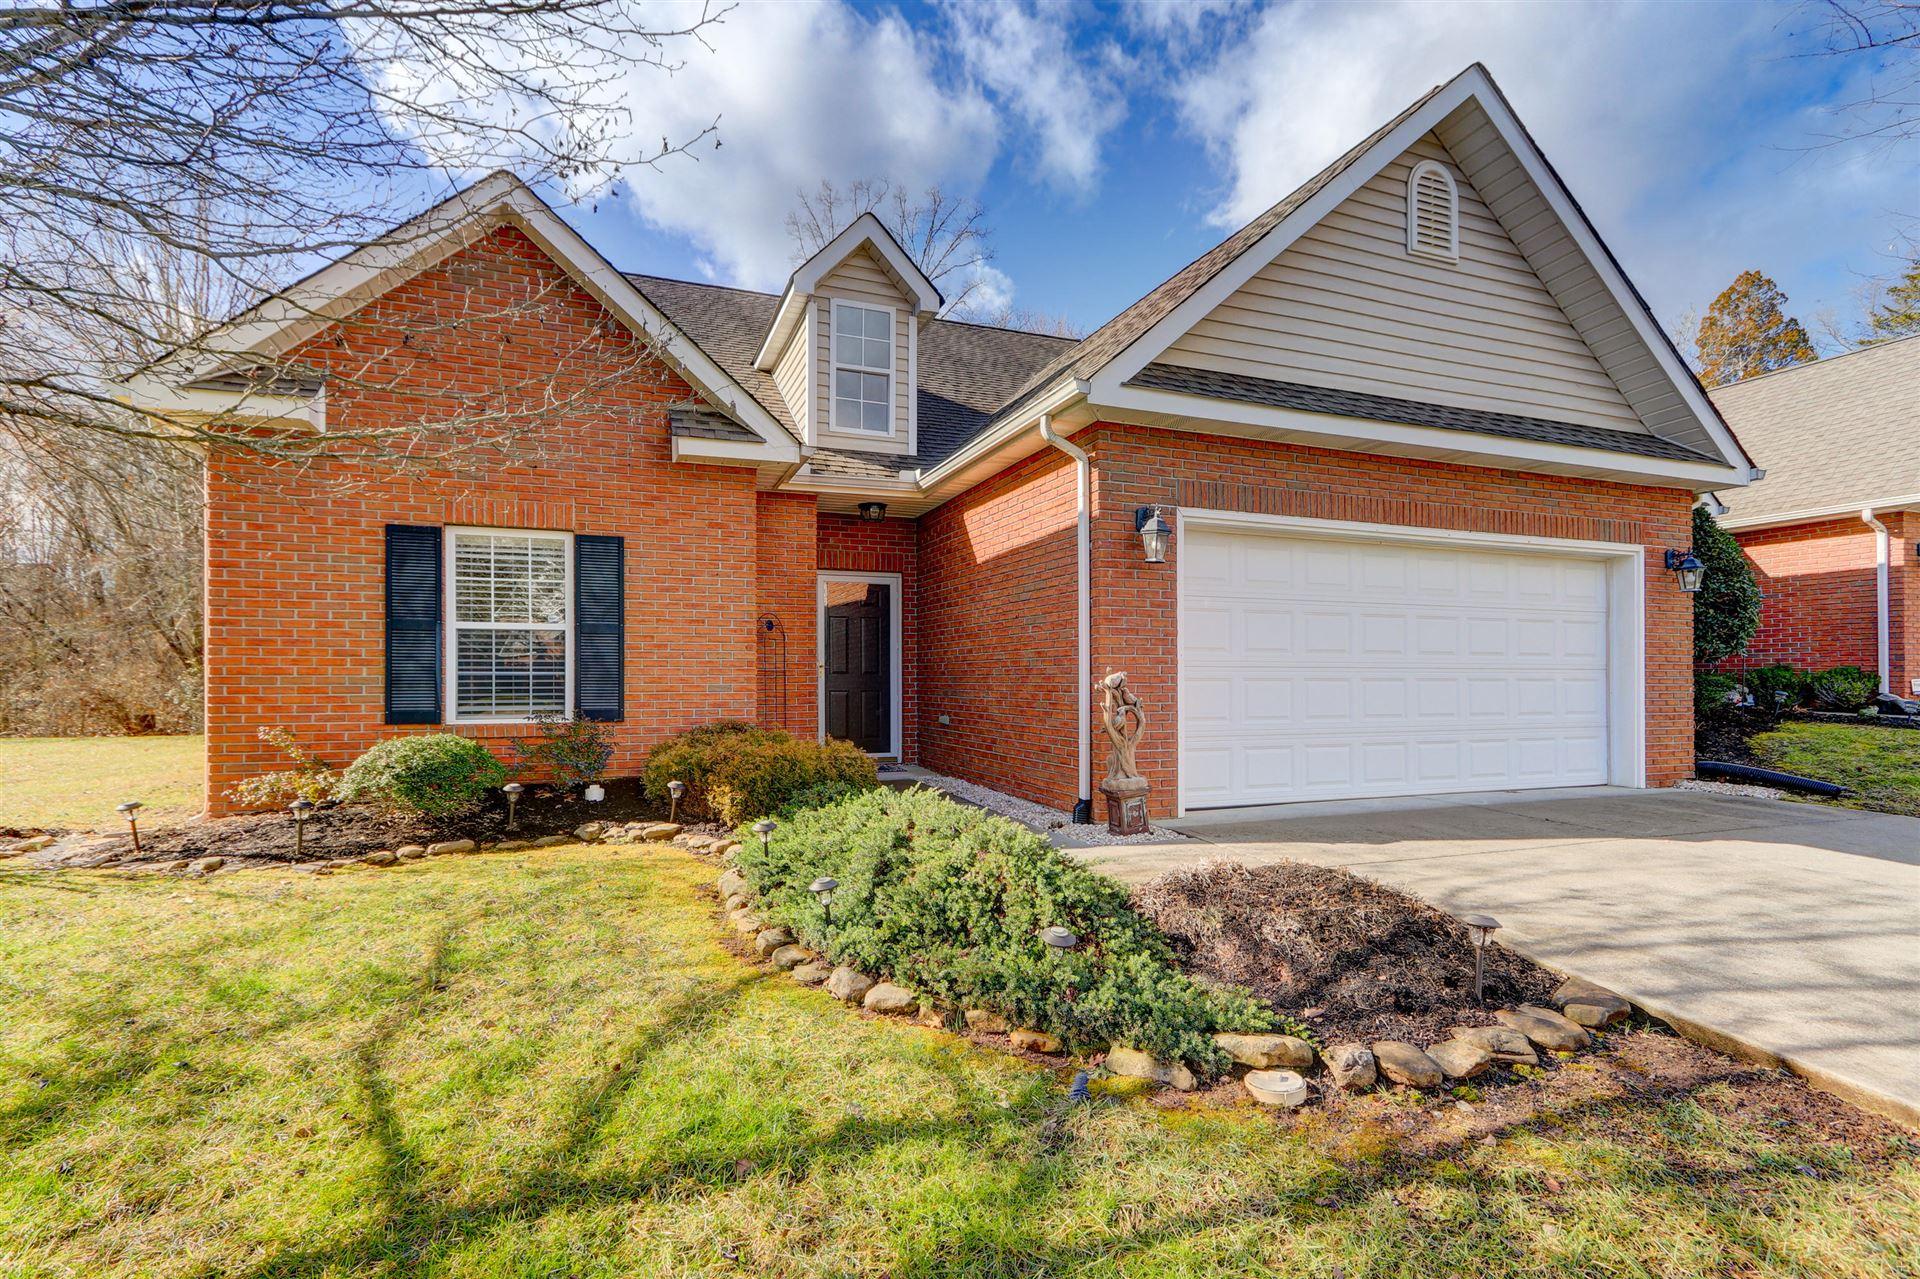 Photo of 7129 Winter Oaks Way, Knoxville, TN 37918 (MLS # 1140322)